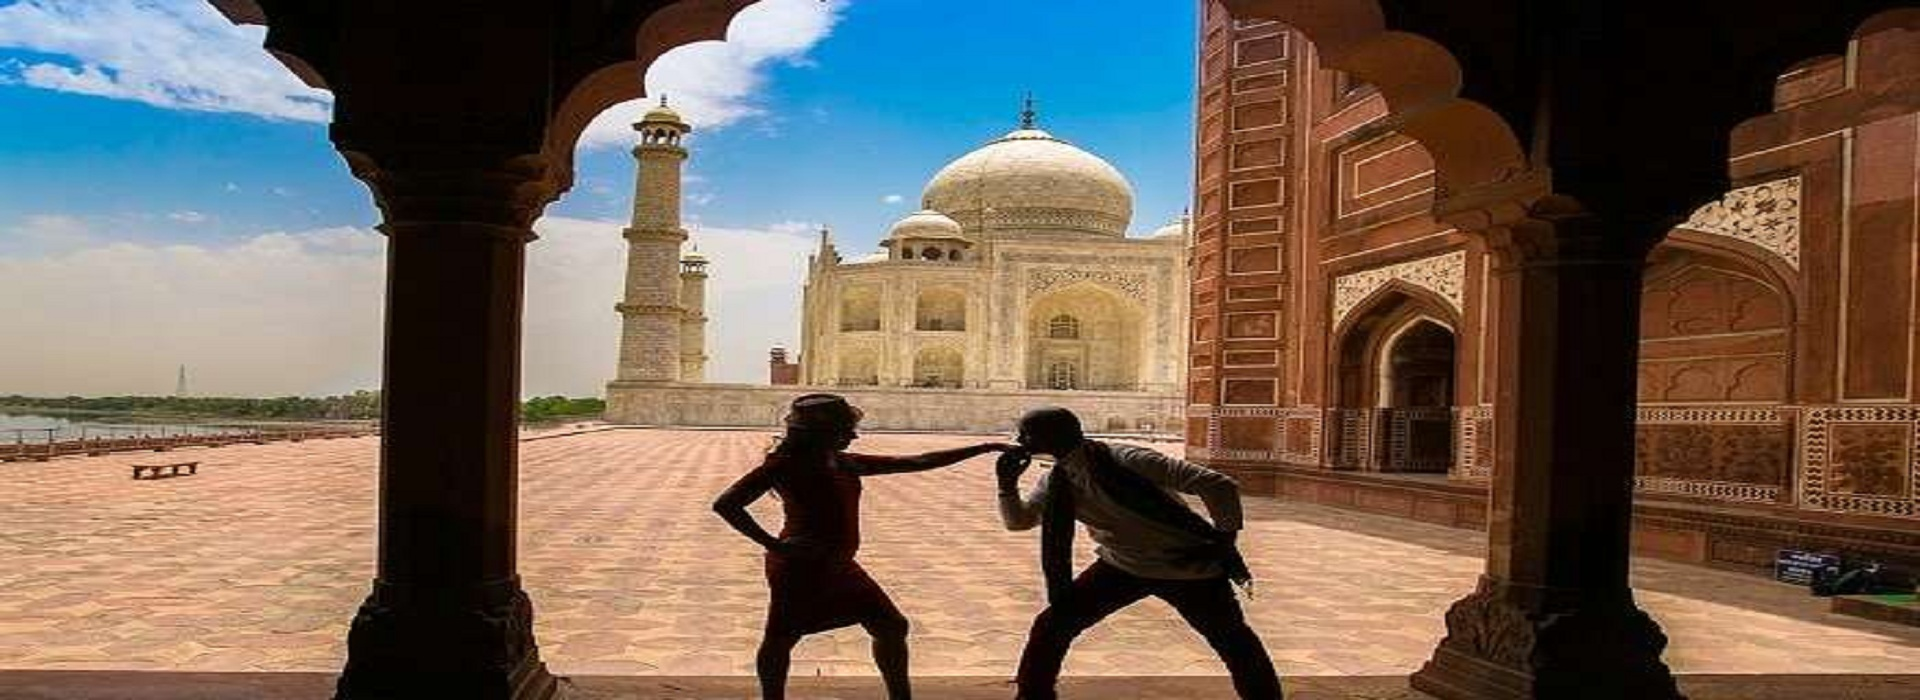 Top Romantic Places in Agra